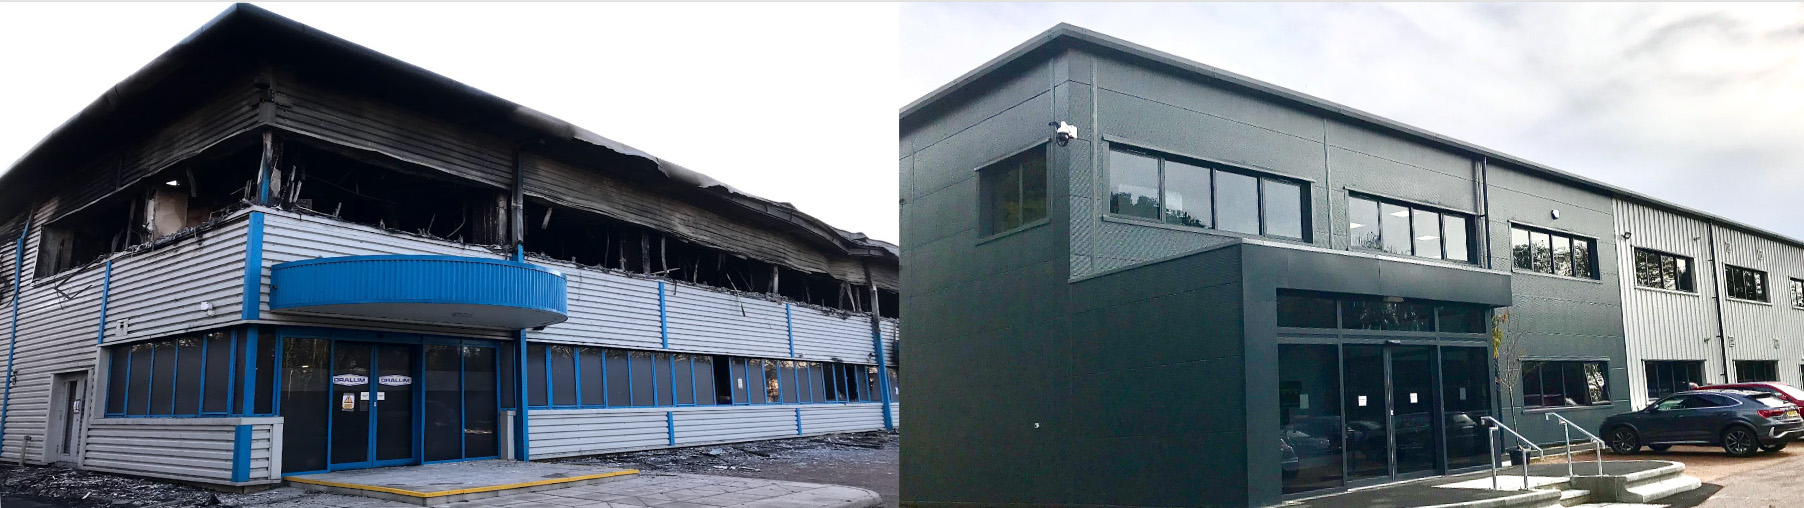 Drallim_New_Building.jpg